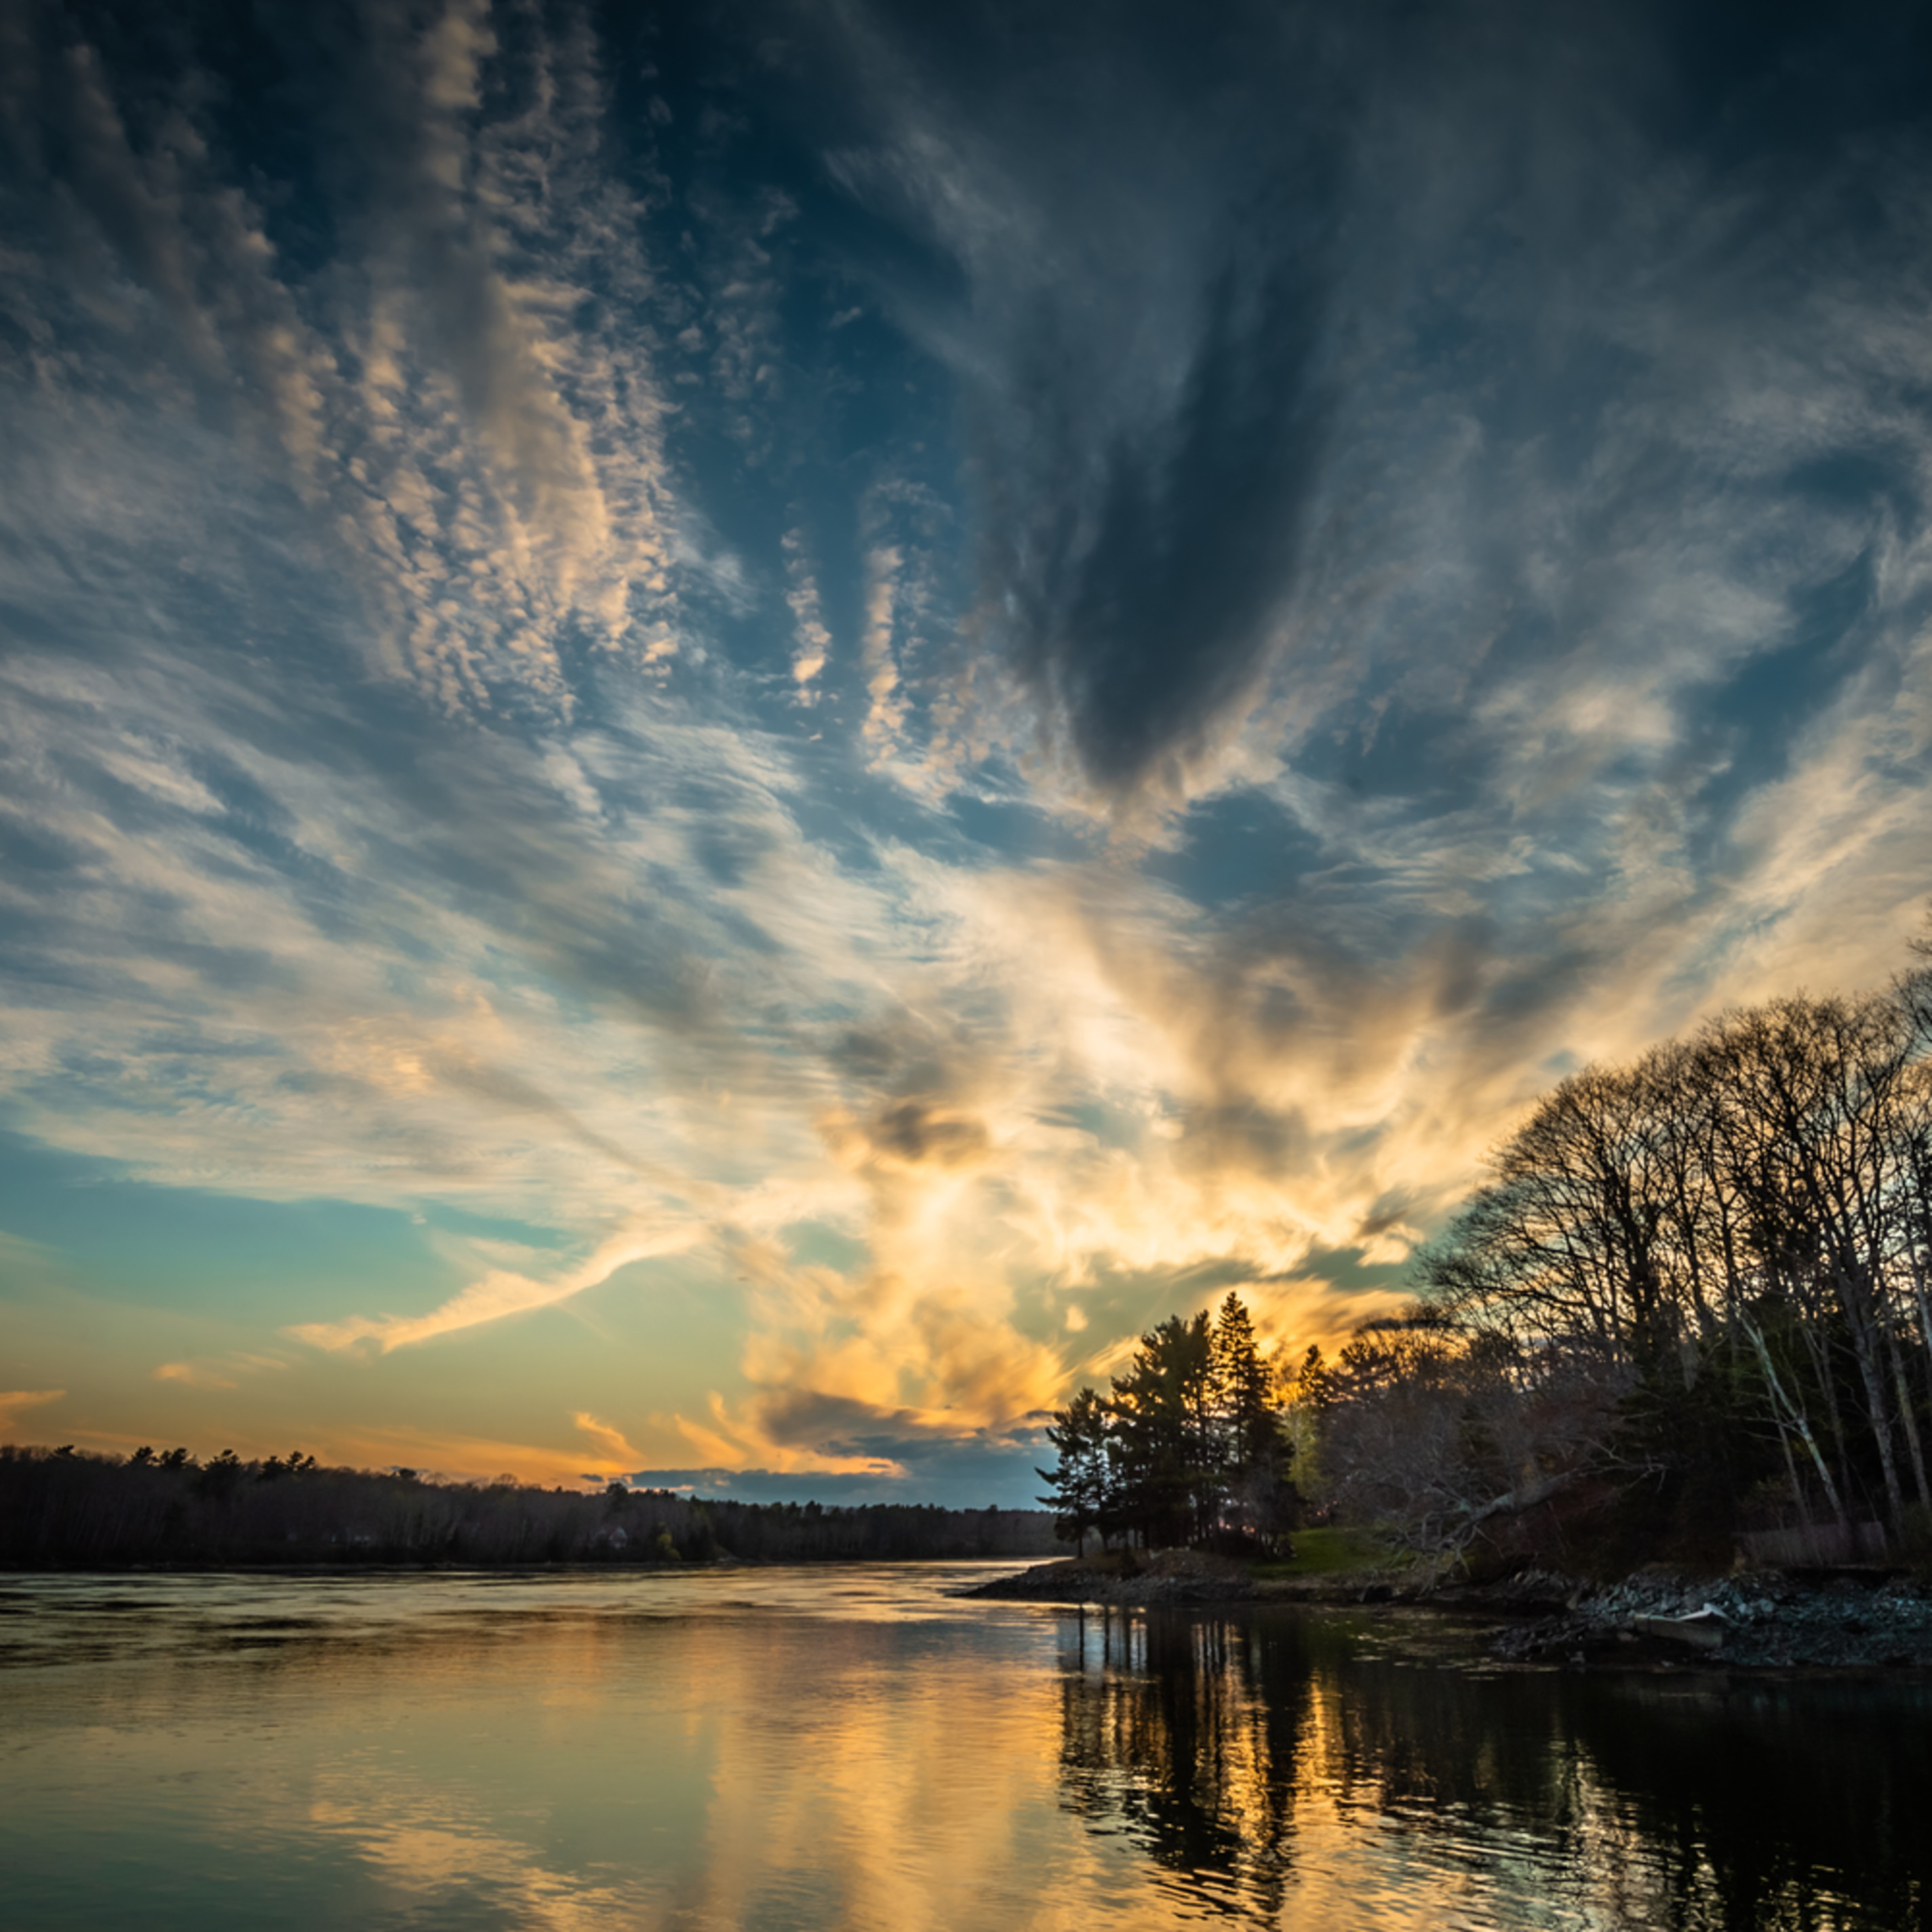 Tb sunset i9jc6l